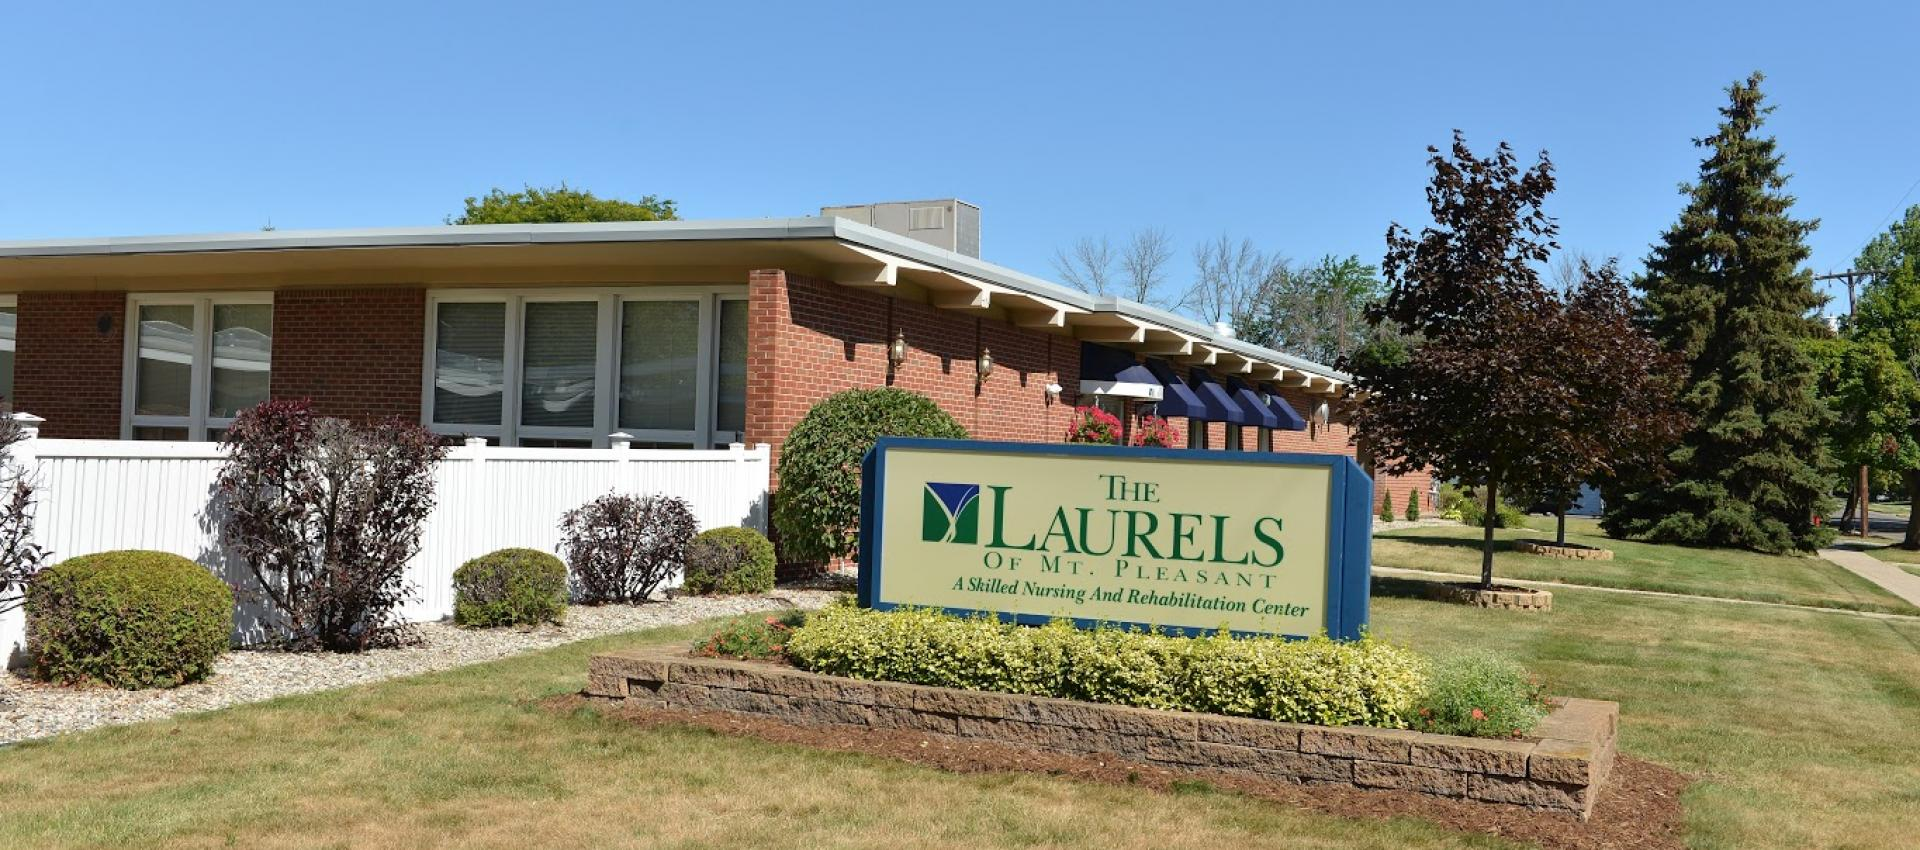 Laurel Health Care Company The Laurels Of Mt Pleasant